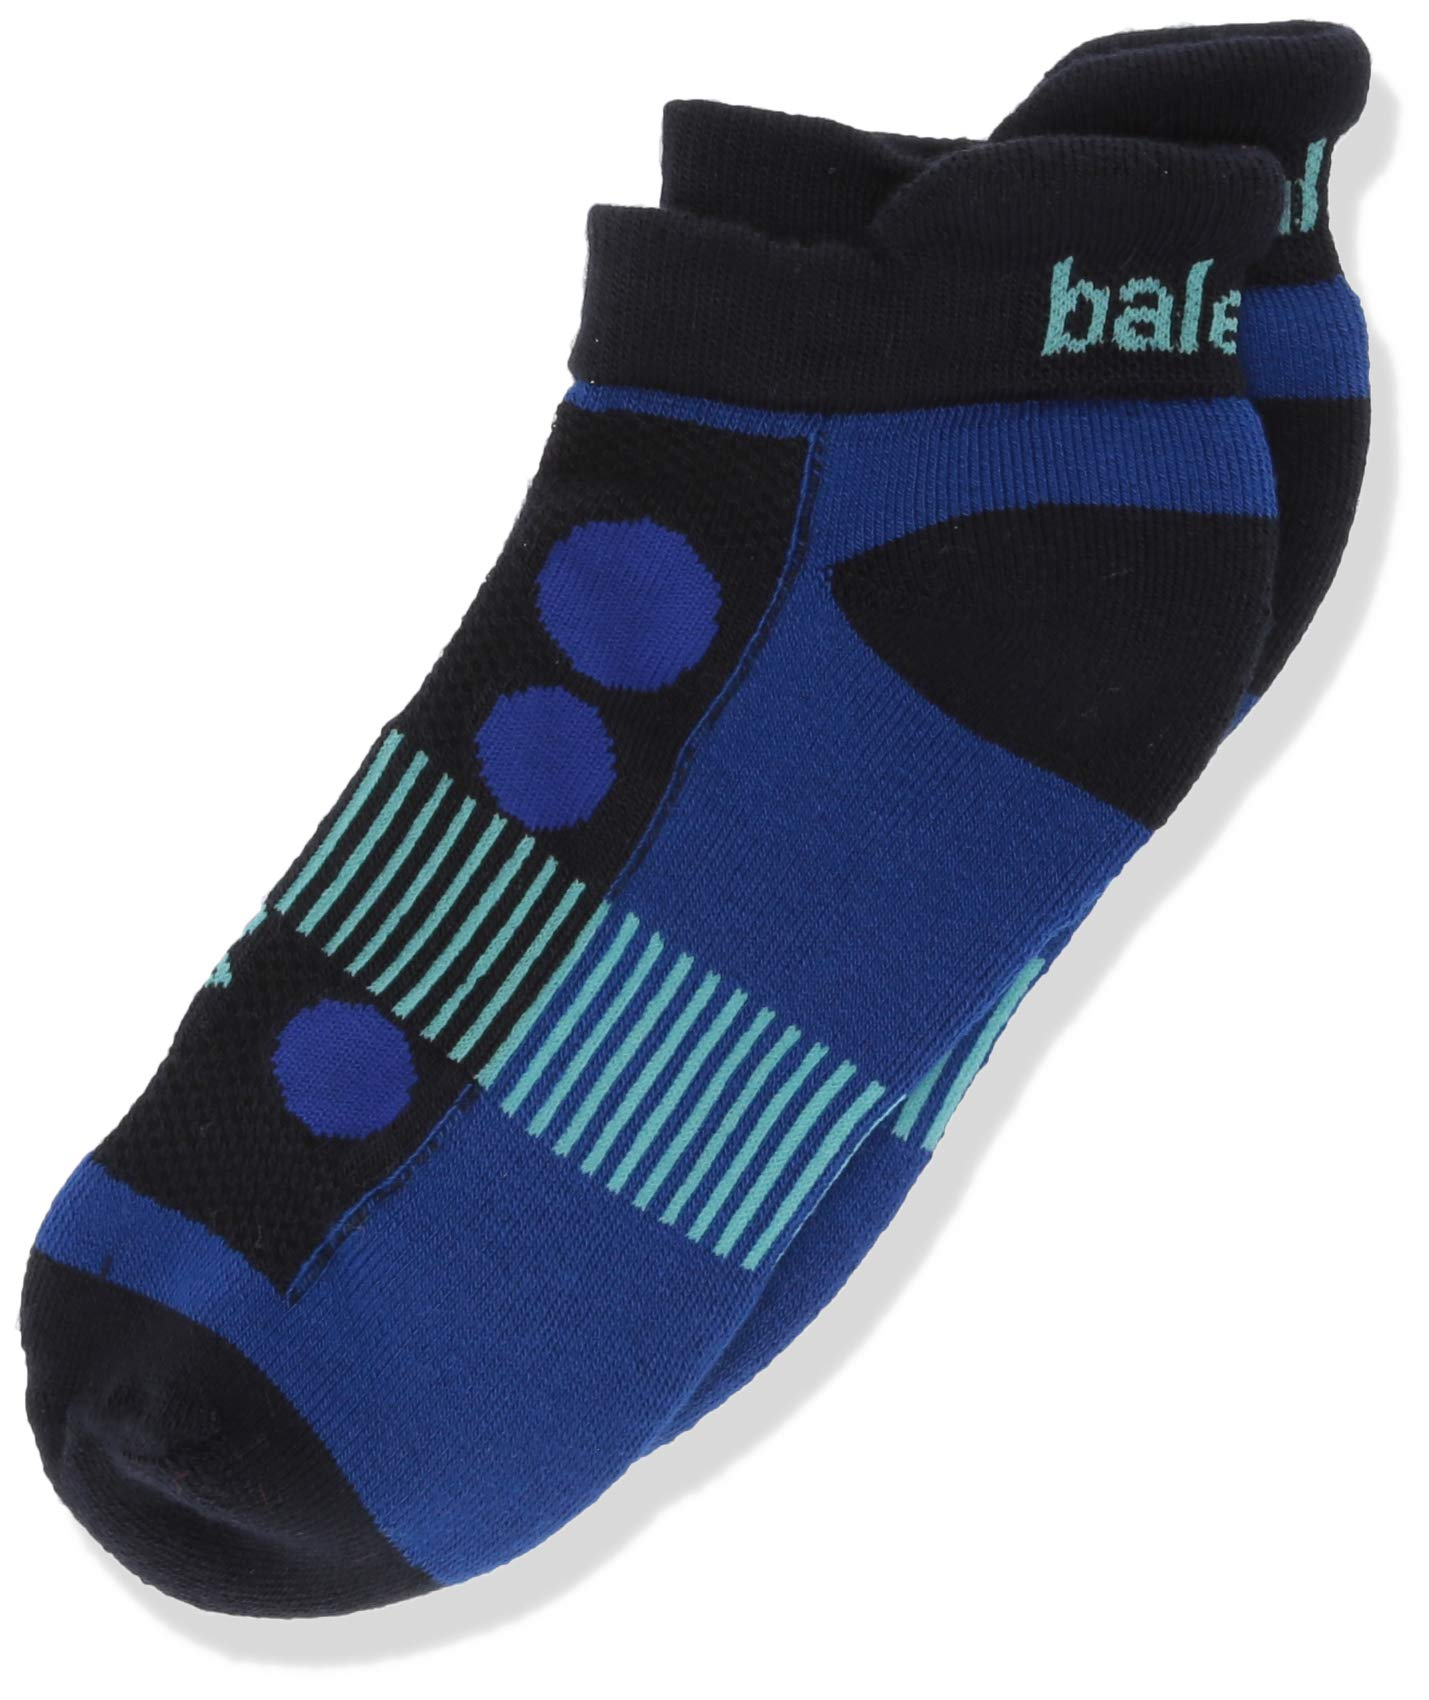 Balega Kids Hidden Cool Socks (1 Pair), Navy/Cobalt, Large by Balega